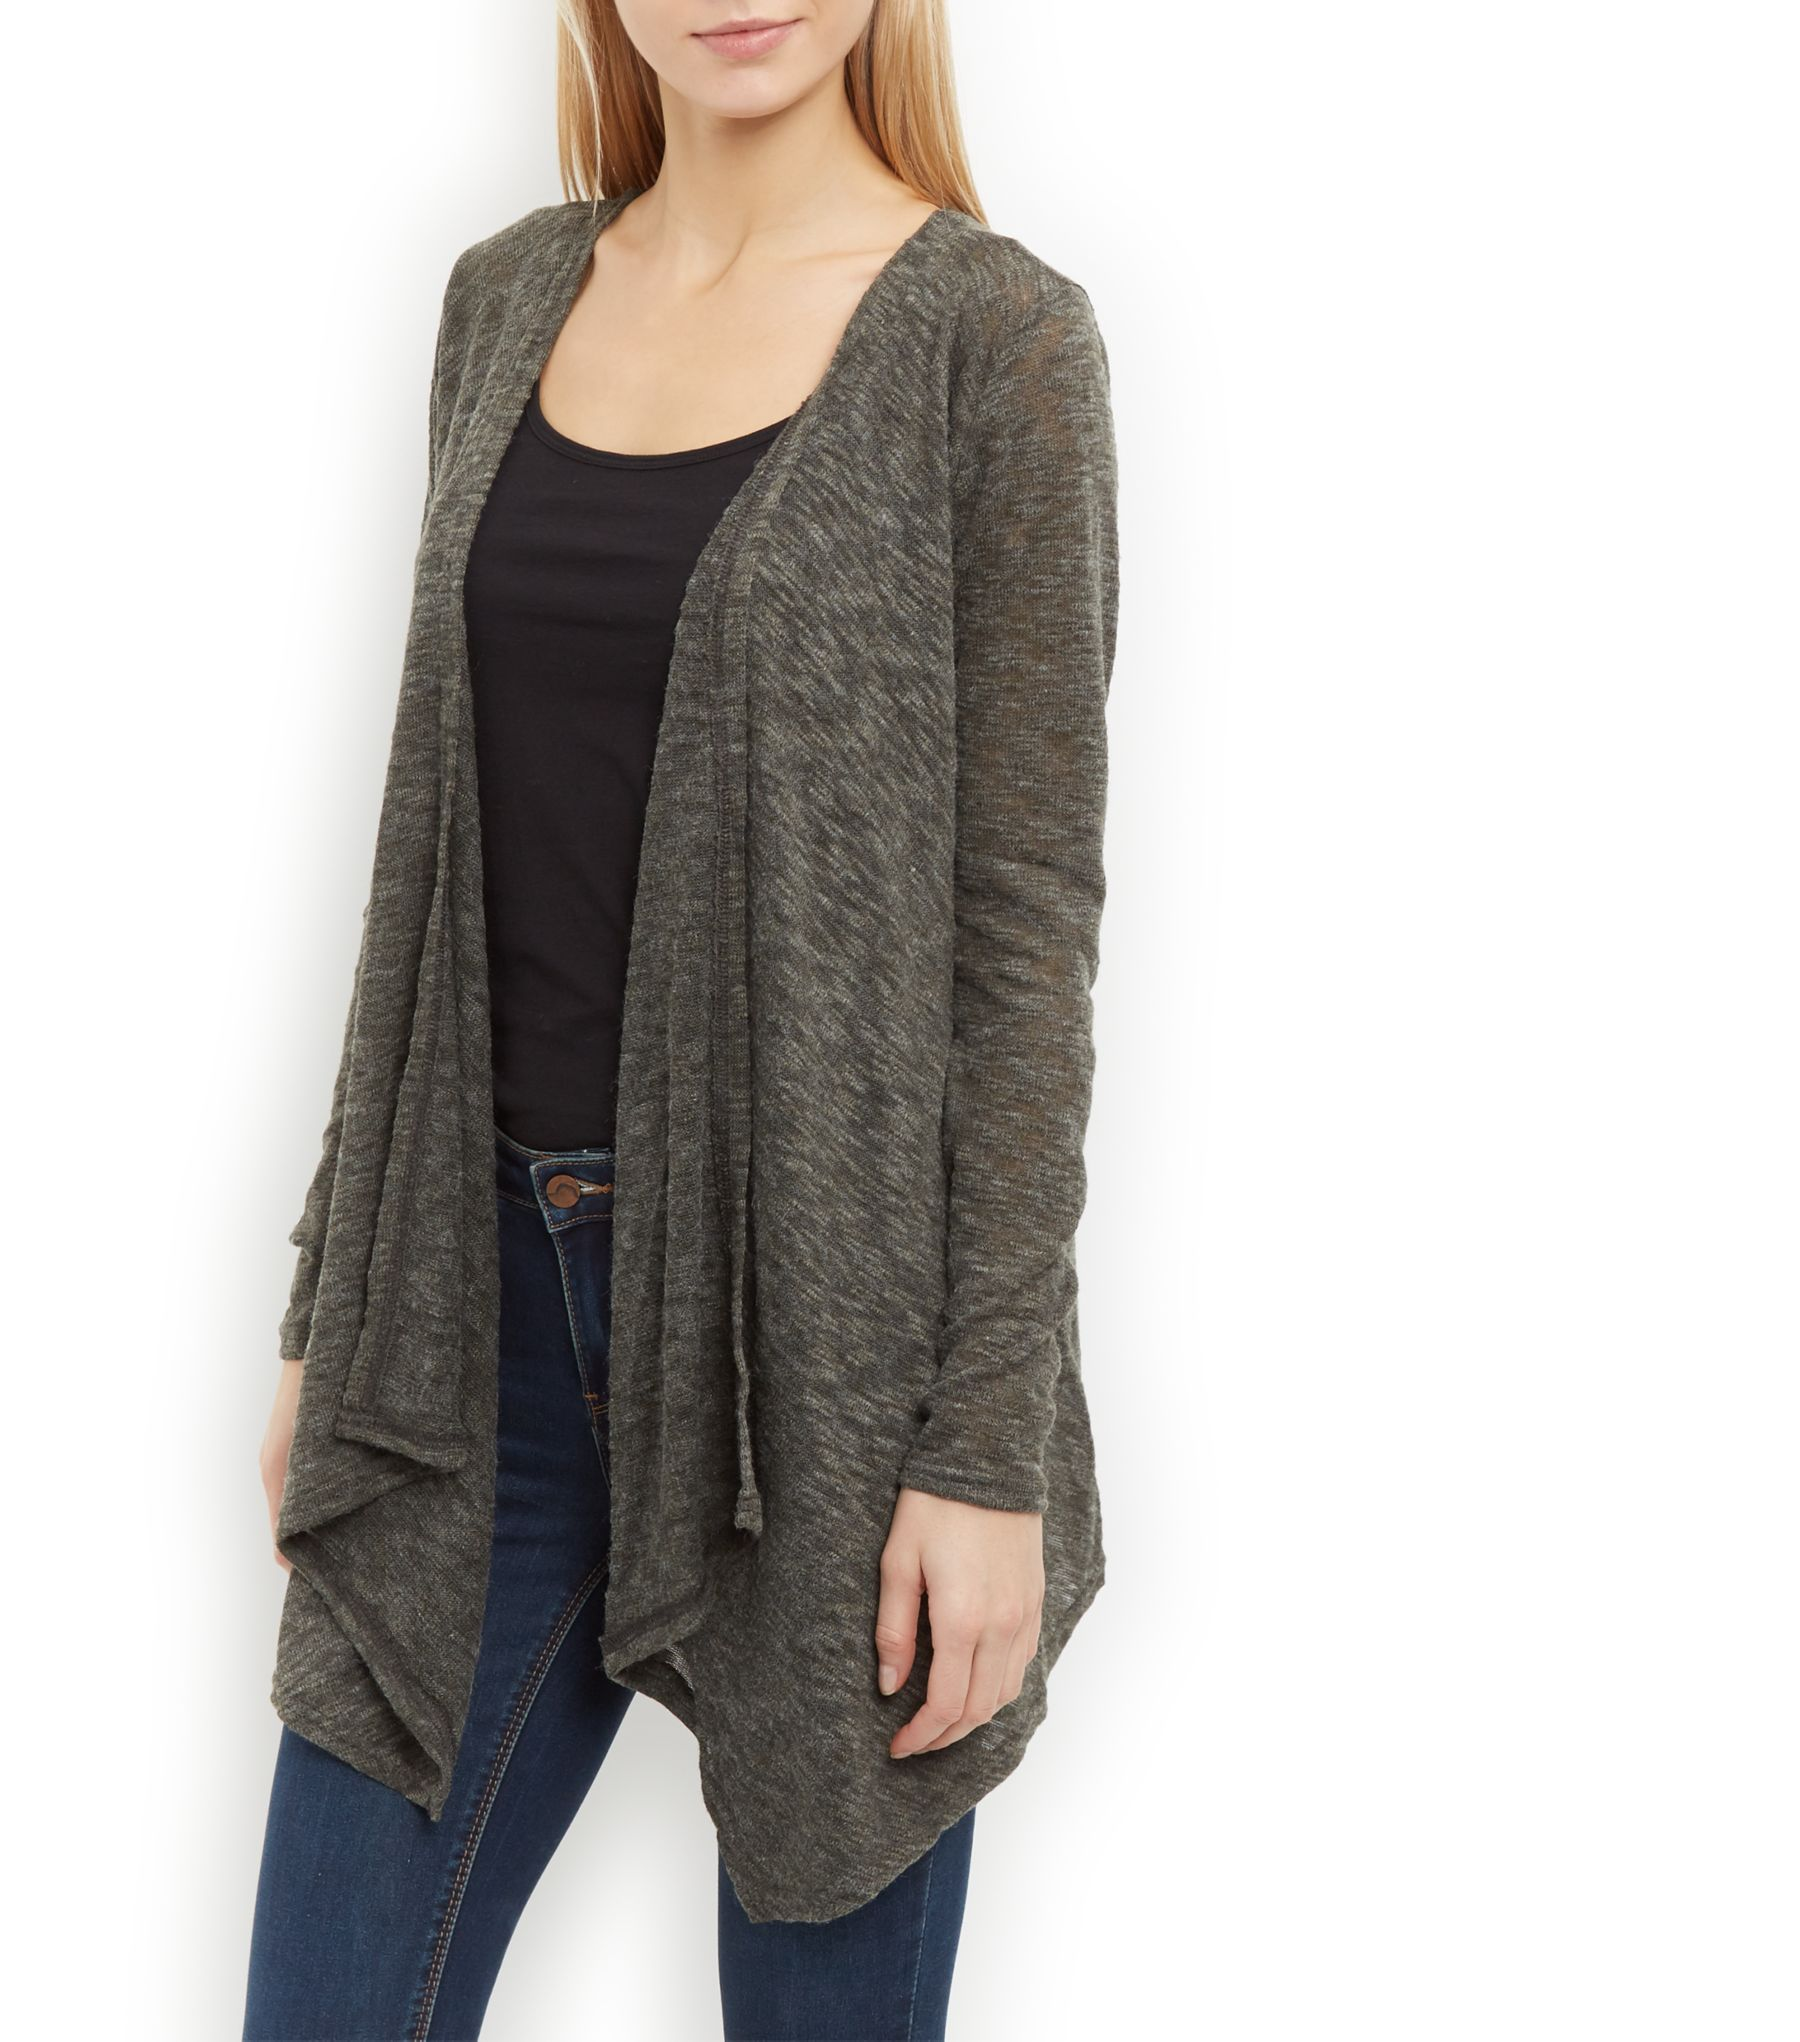 Khaki Fine Knit Slub Waterfall Cardigan | Khakis, Womens knitwear ...